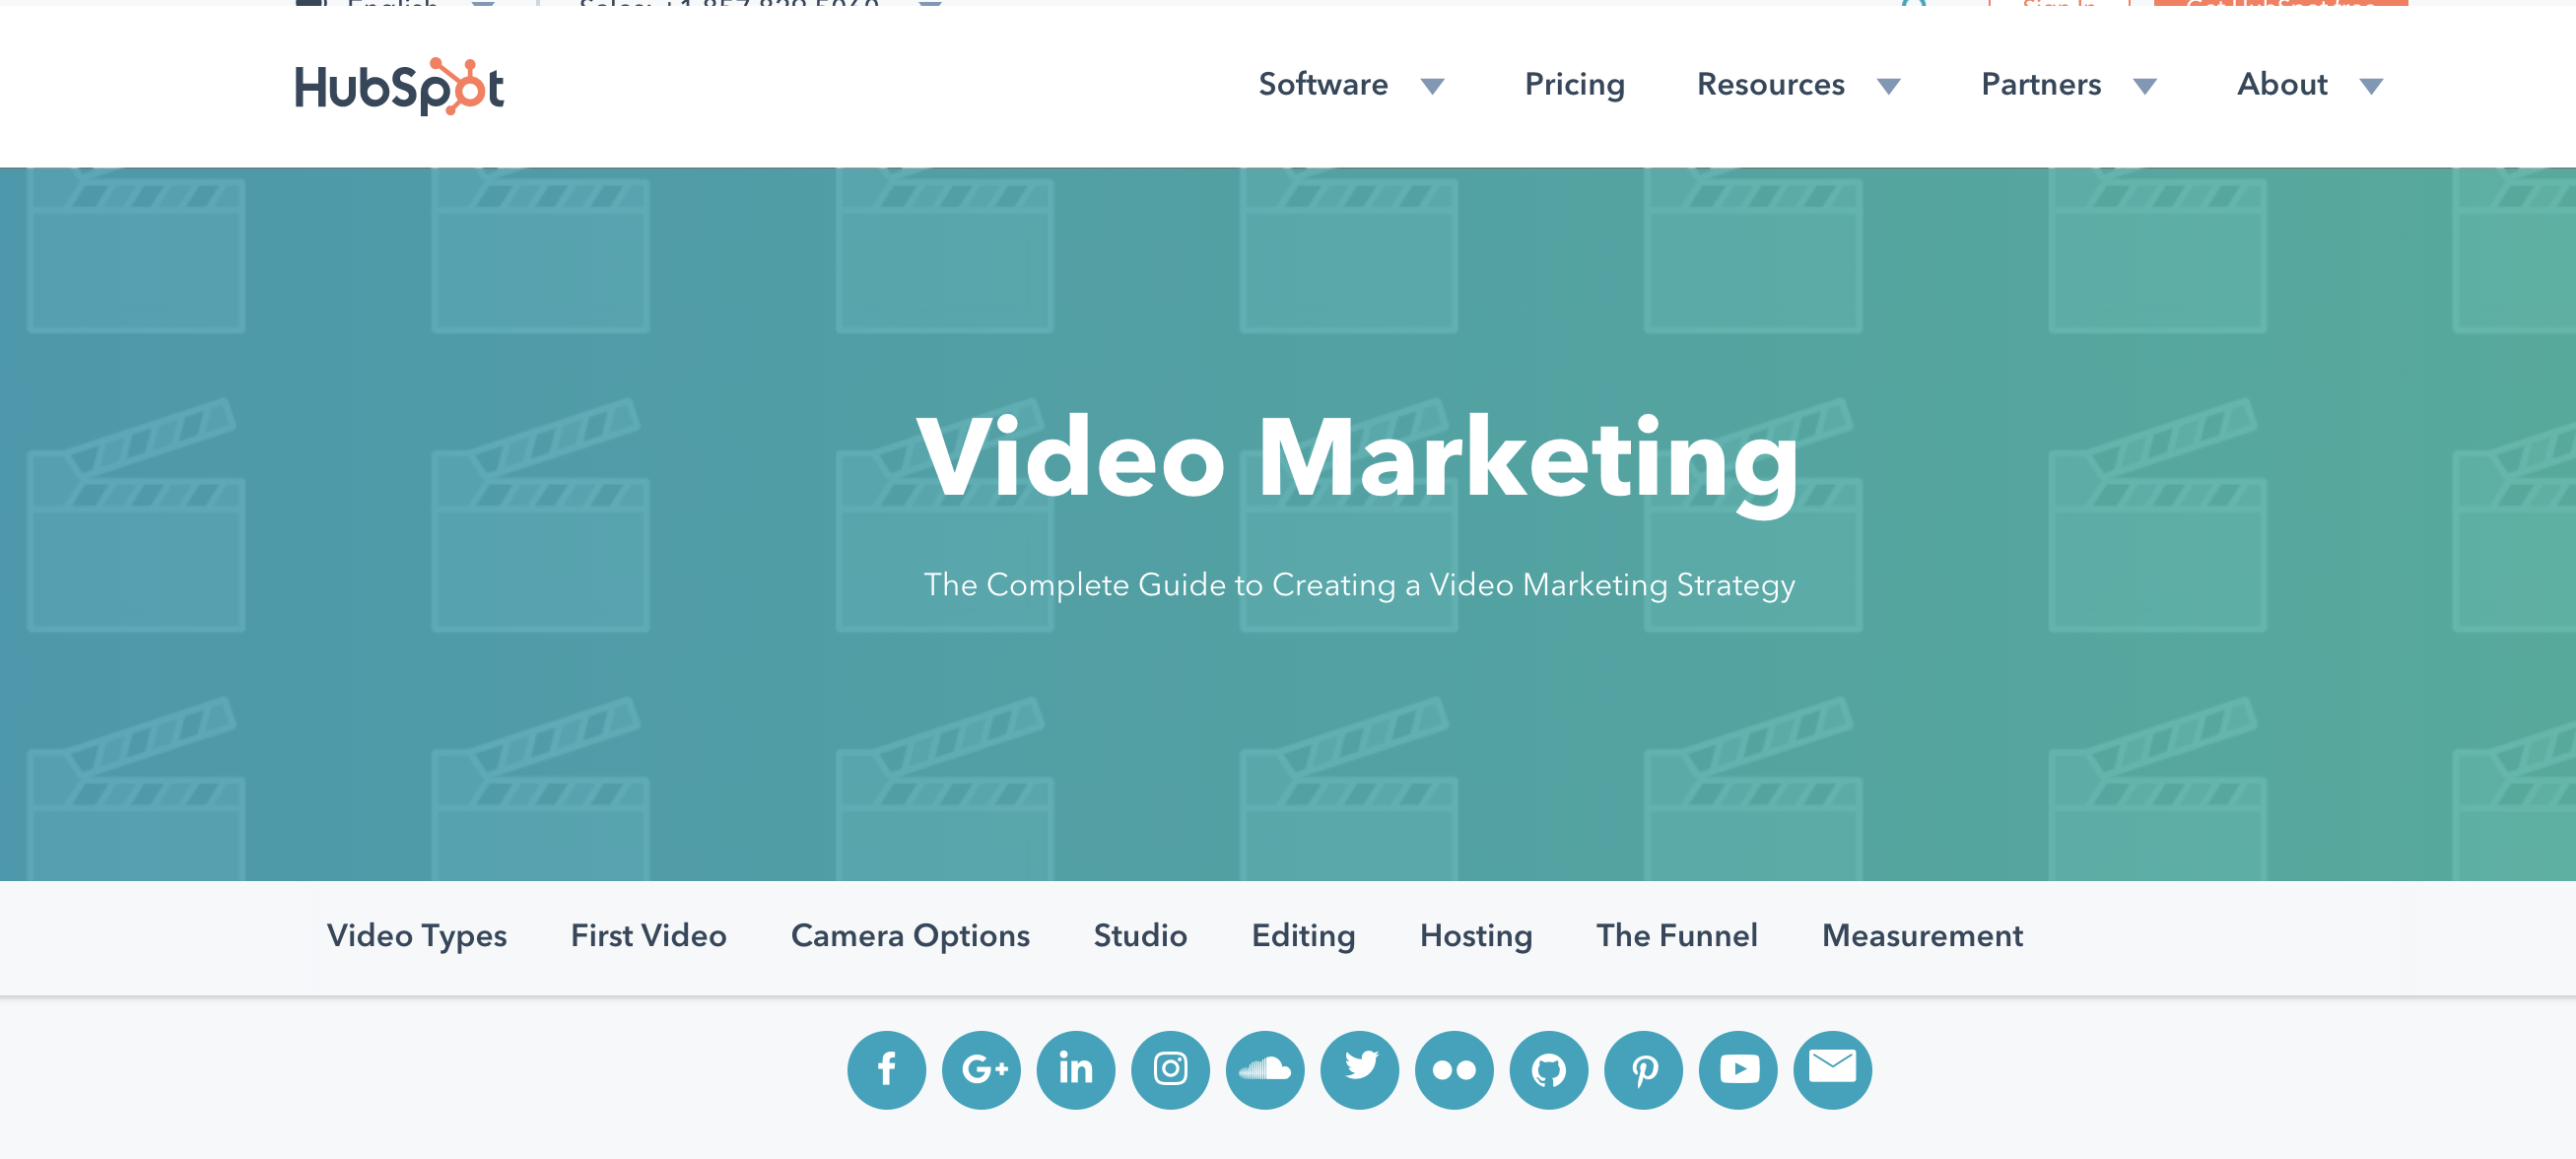 hubspot video marketing